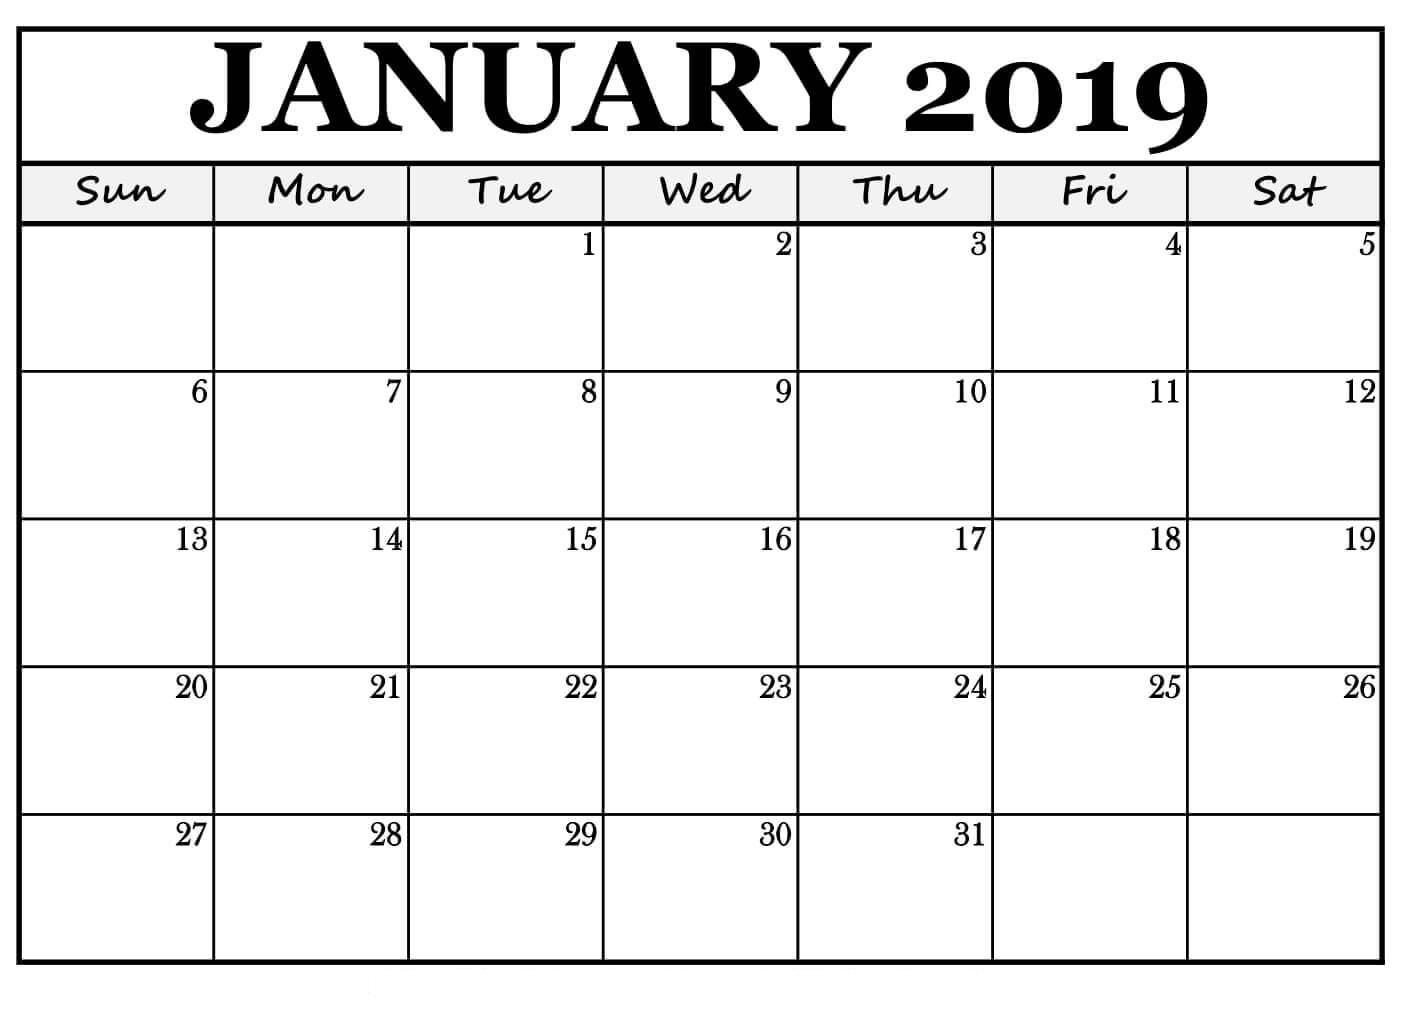 january 2019 calendar printable images download